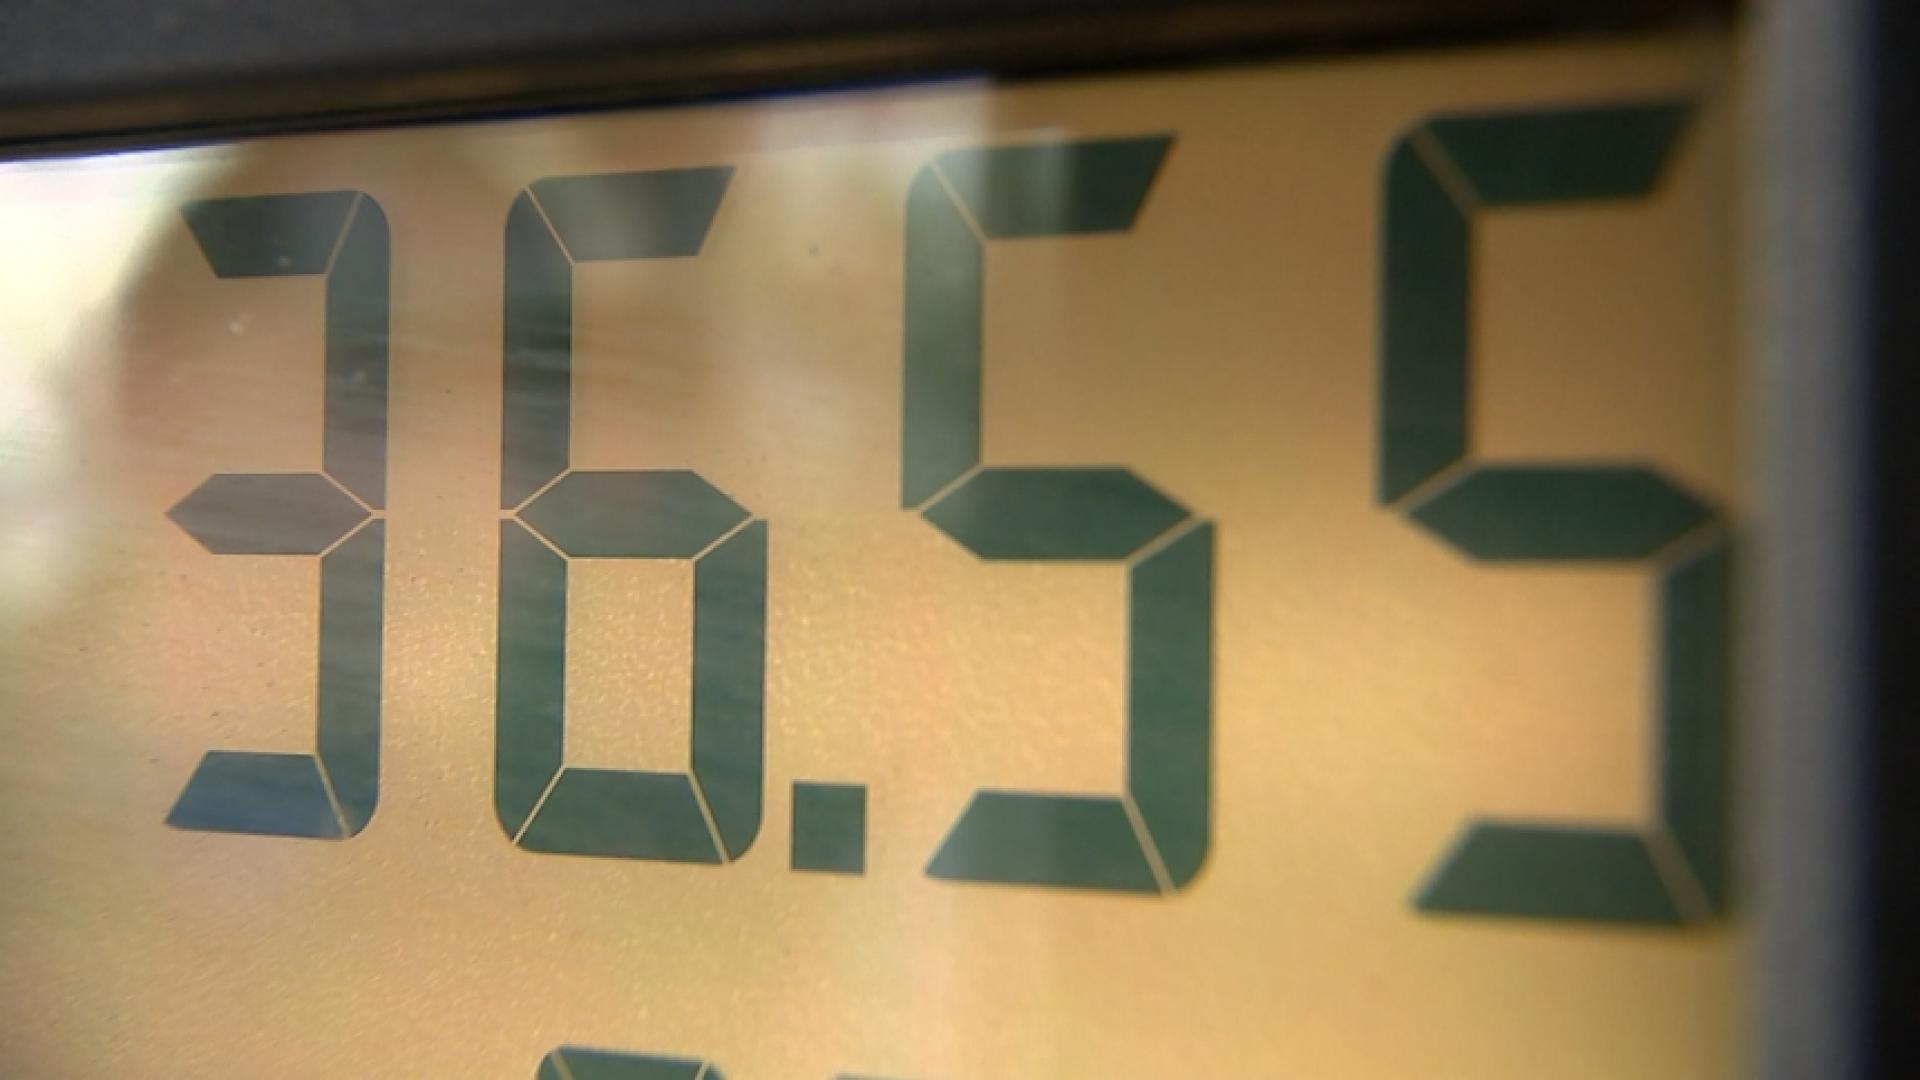 NC_gasprices0831_1920x1080_1535989286094.jpg